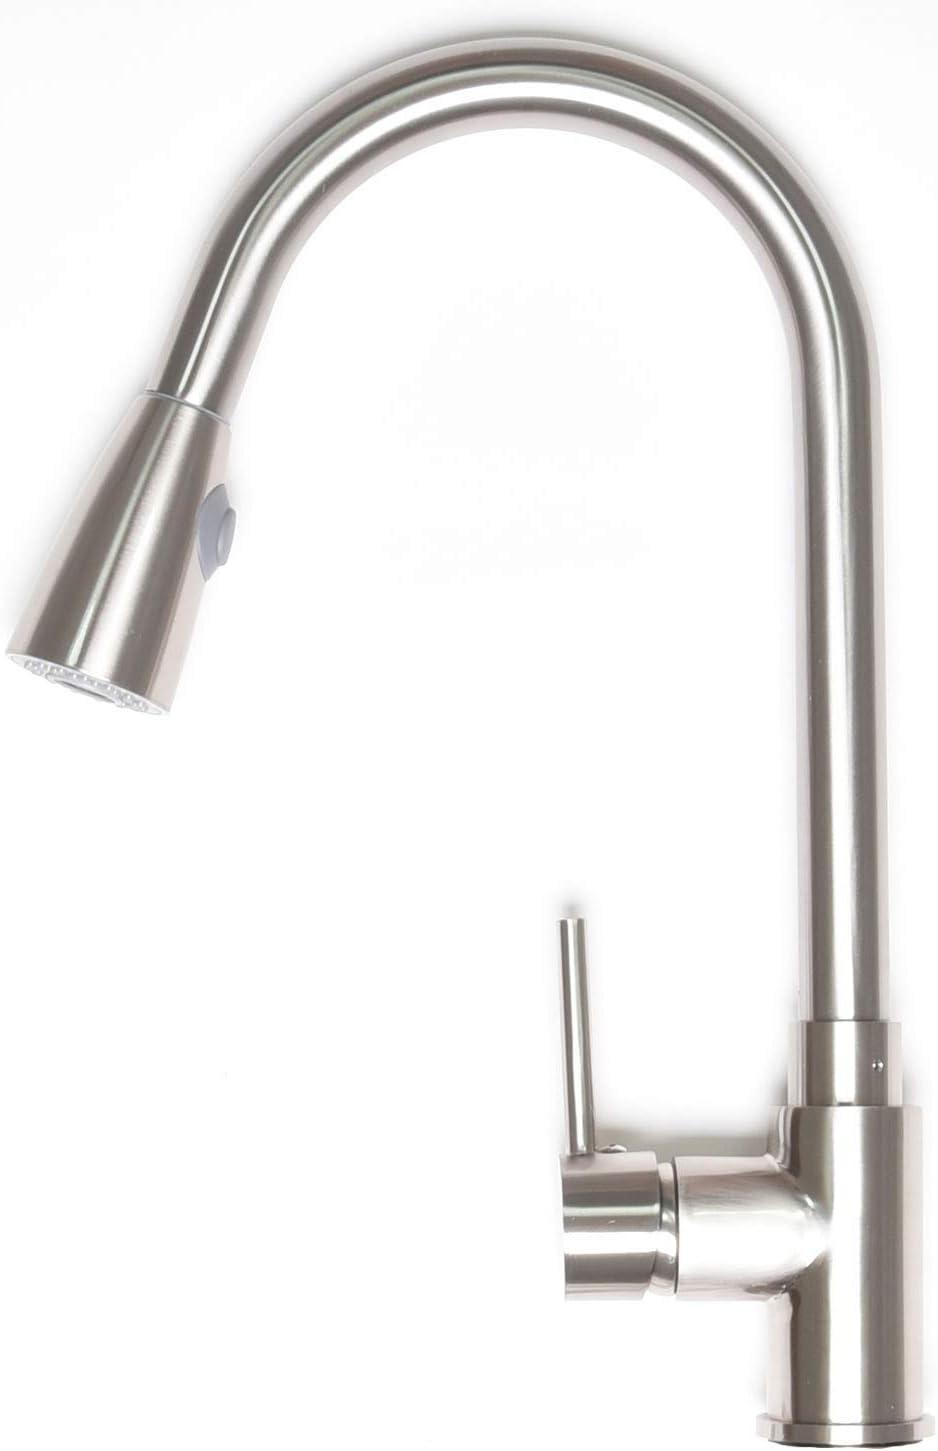 Zenvida Modern Single Max 75% OFF Handle High Kitchen Popularity Arc Down Pull Faucet